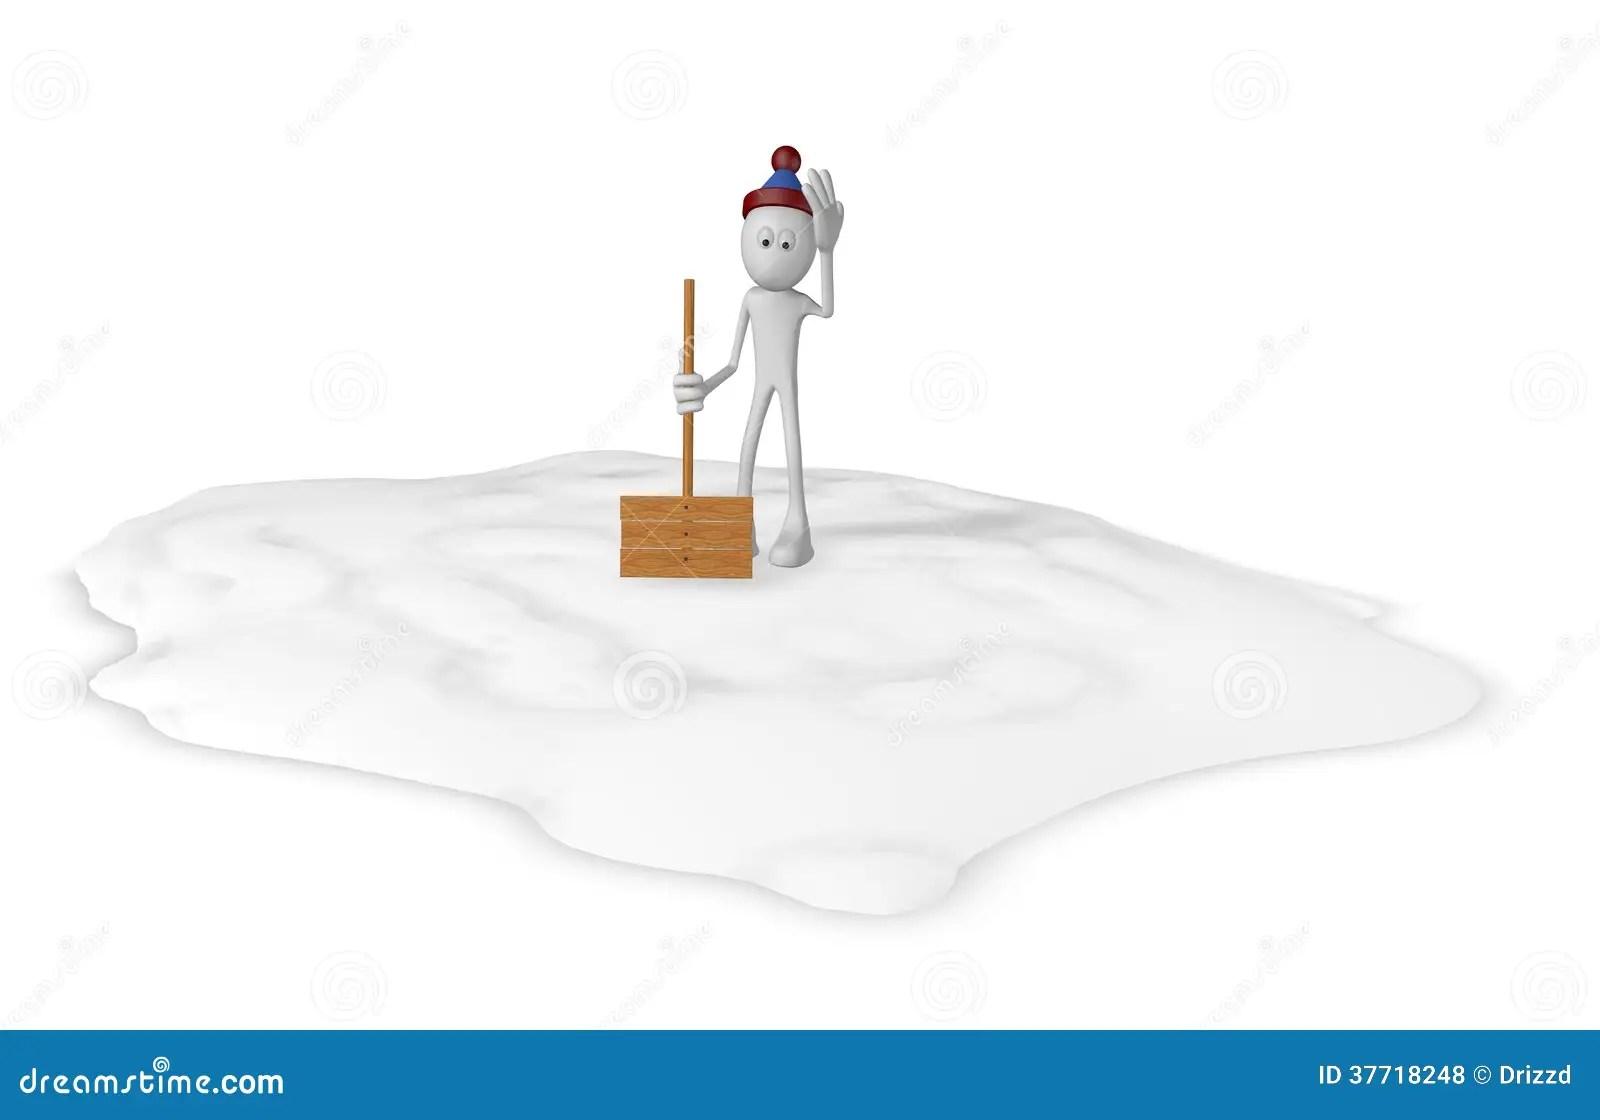 Snow Shovel Stock Illustration